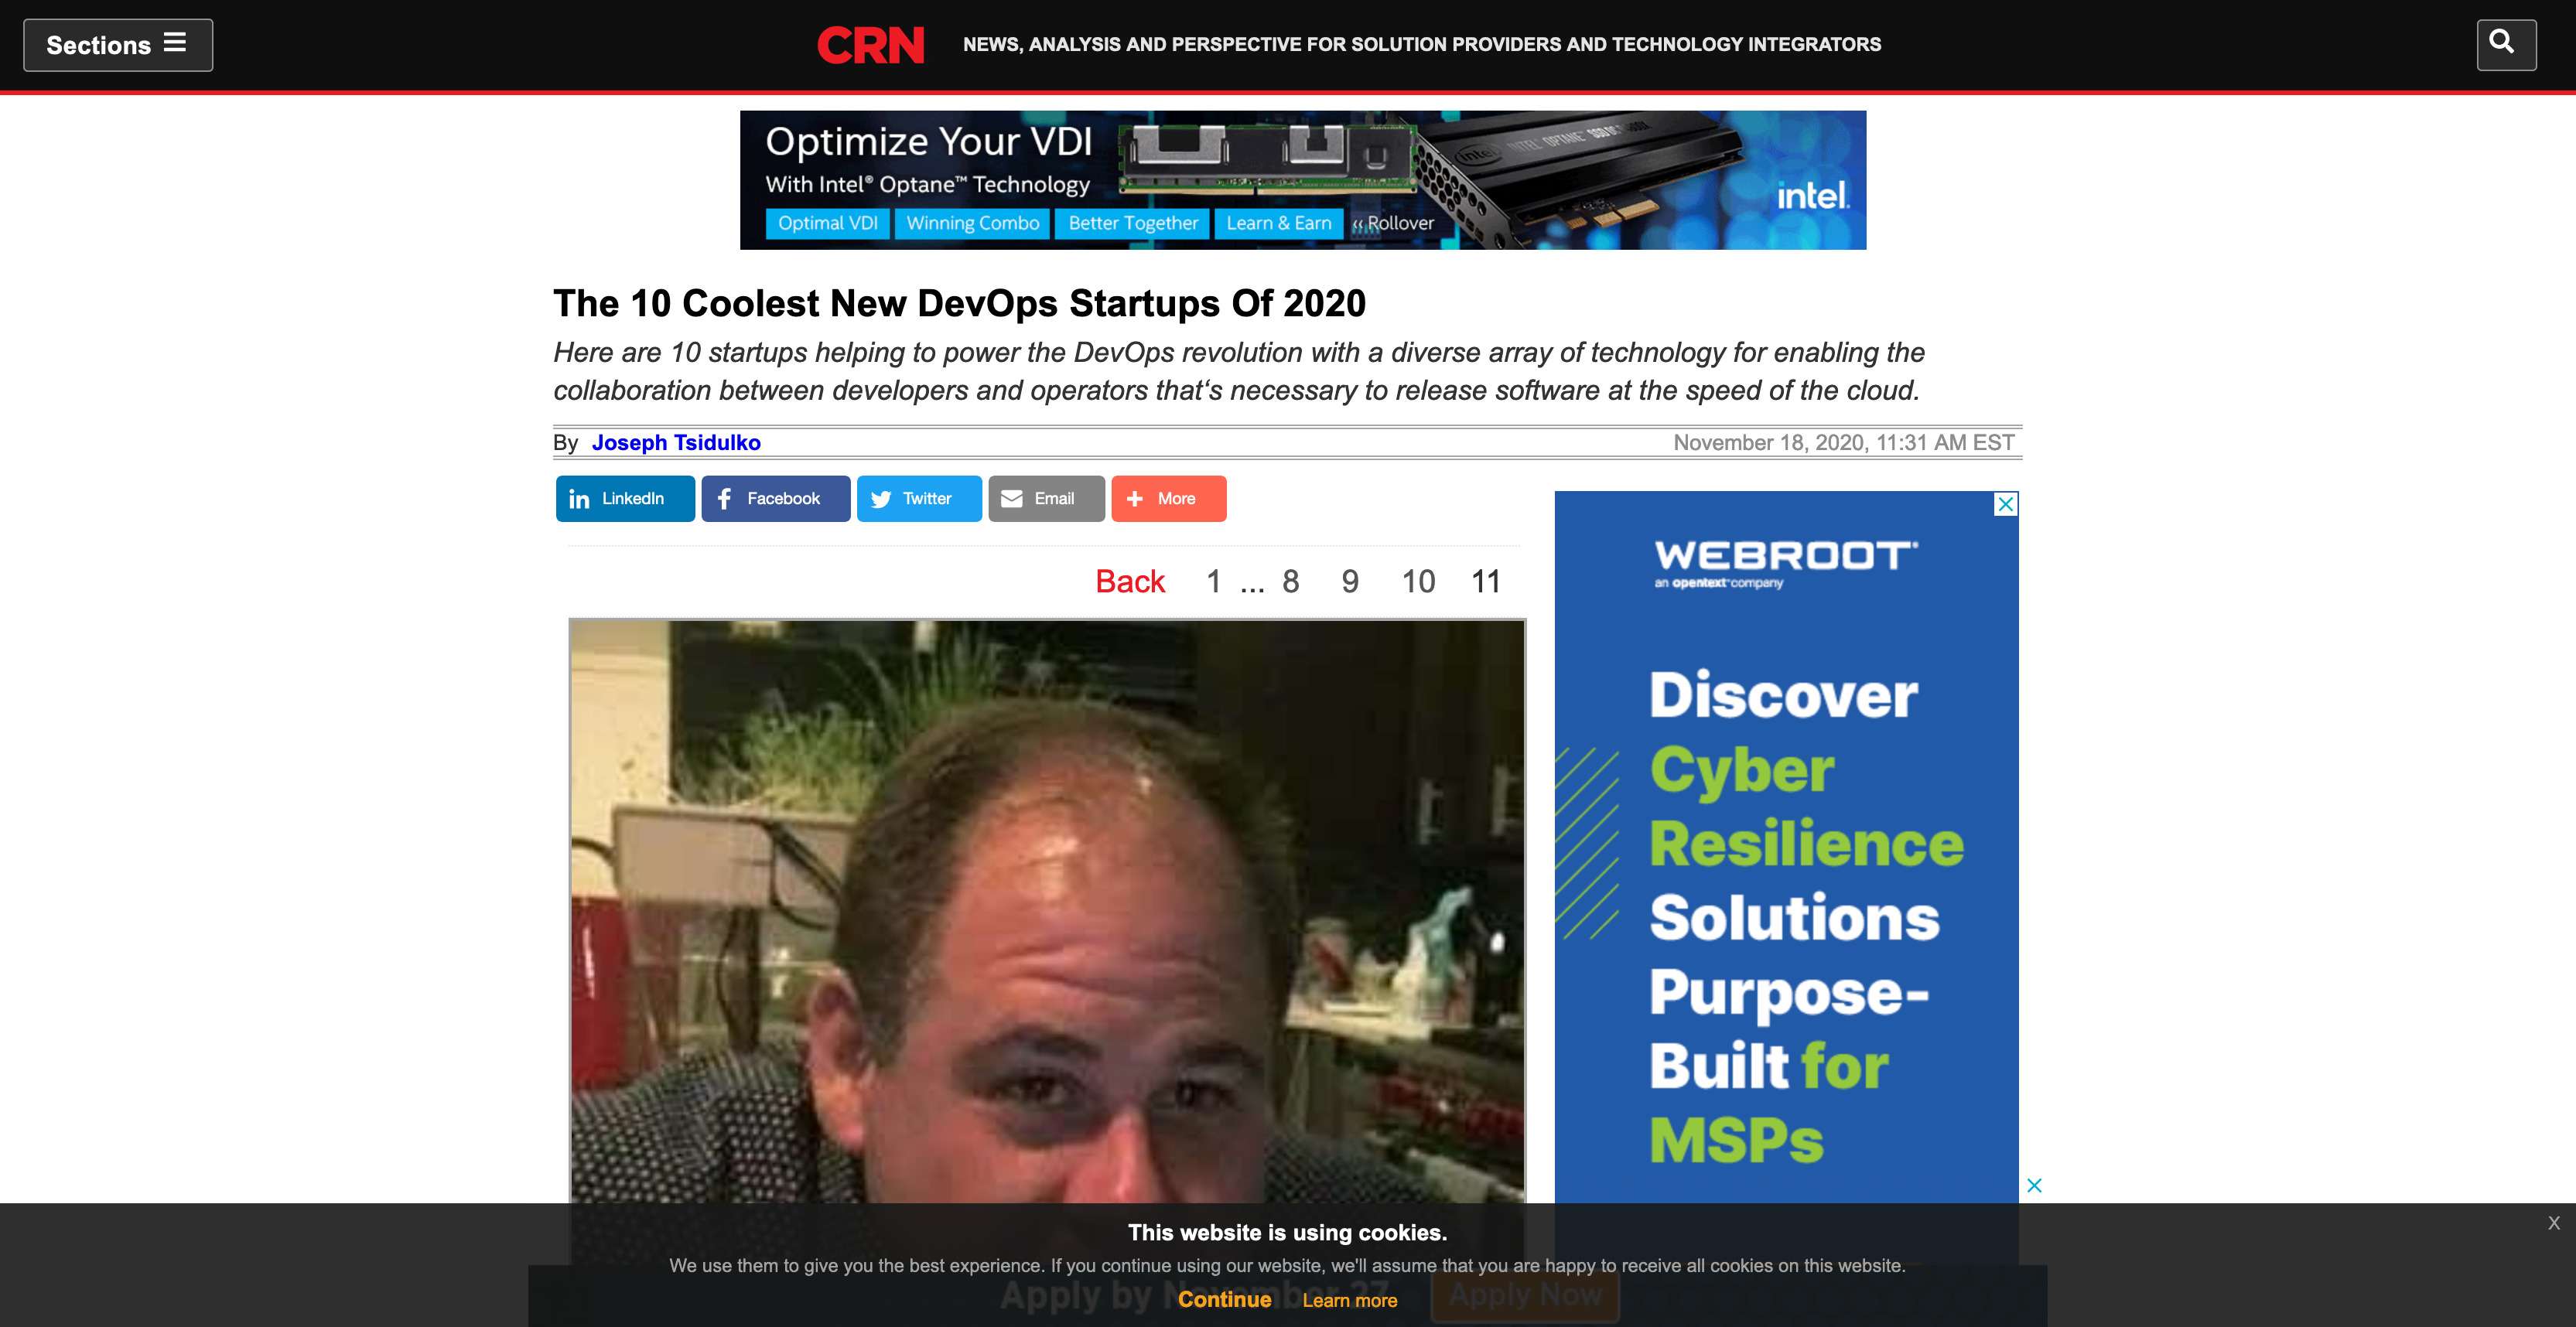 CRN - The 10 Coolest New DevOps Startups Of 2020